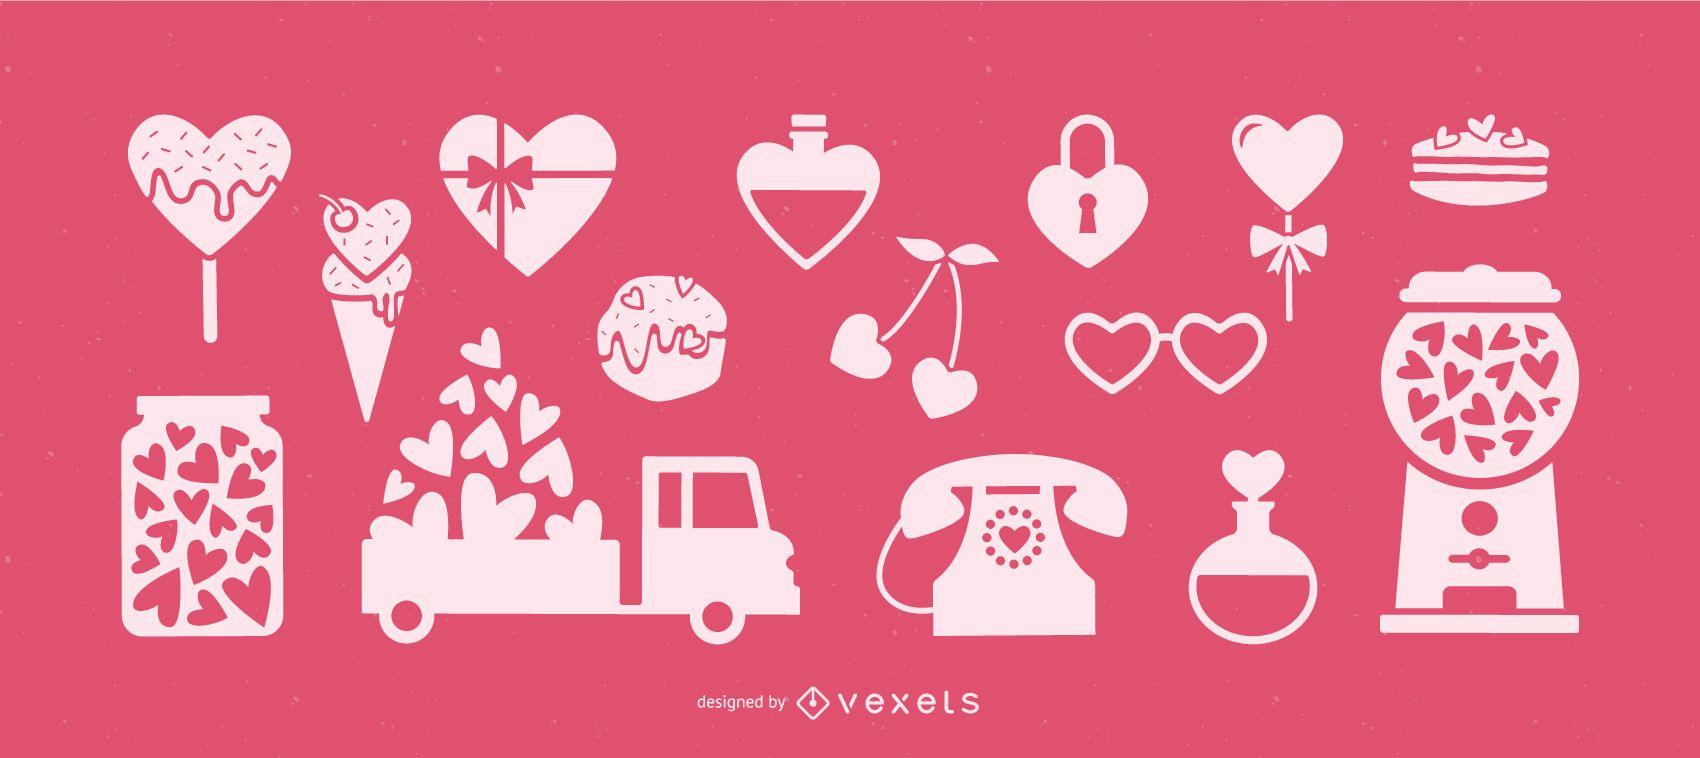 Valentine's day heart elements